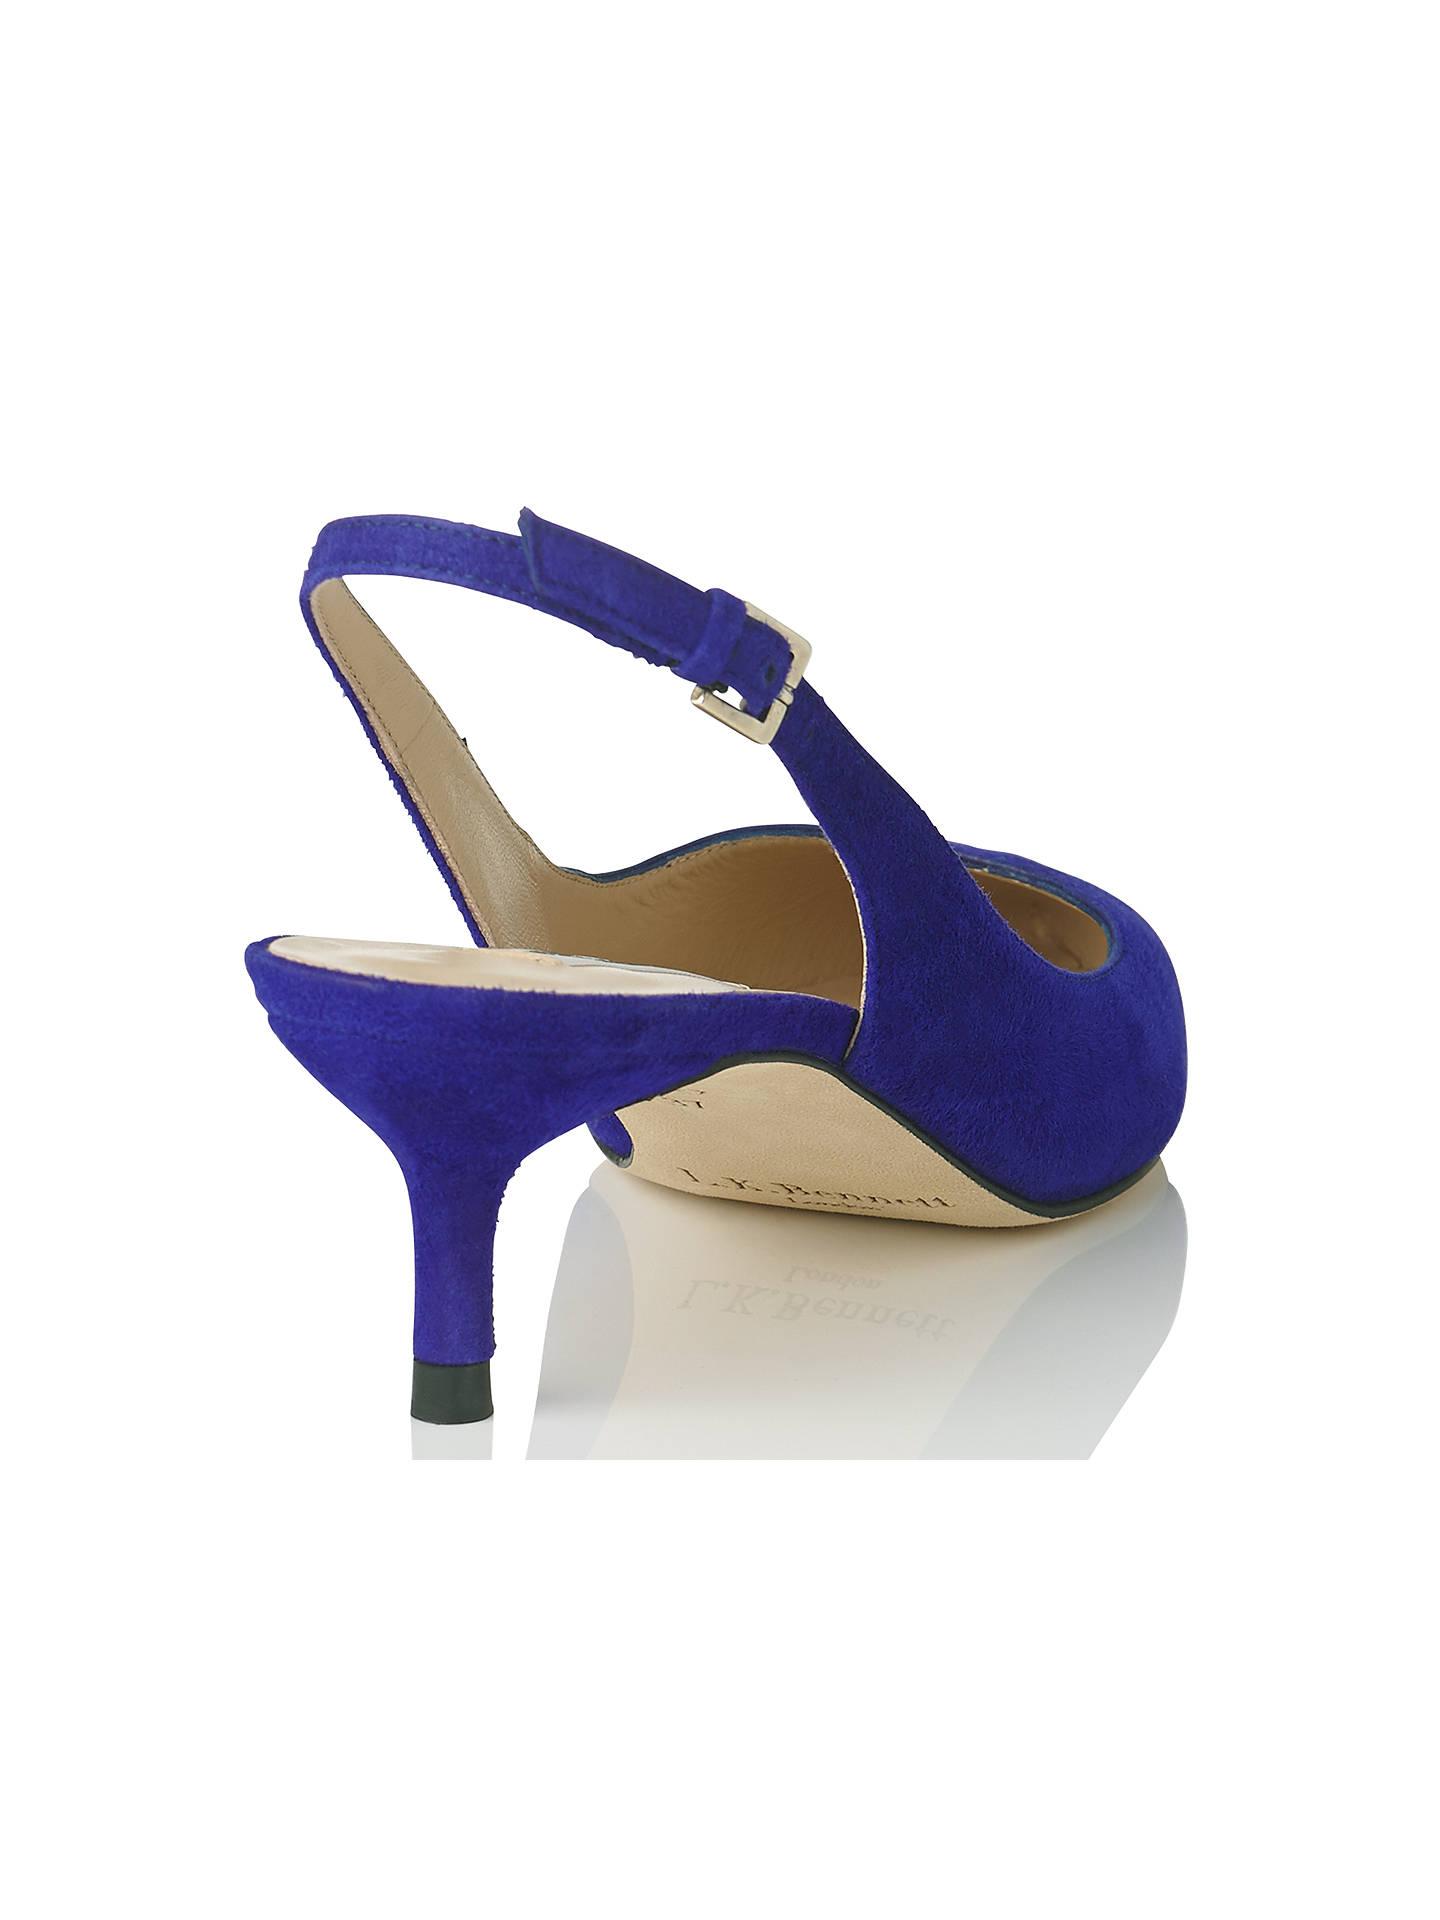 1a291fcc18f ... Buy L.K.Bennett Ava Slingback Court Shoes